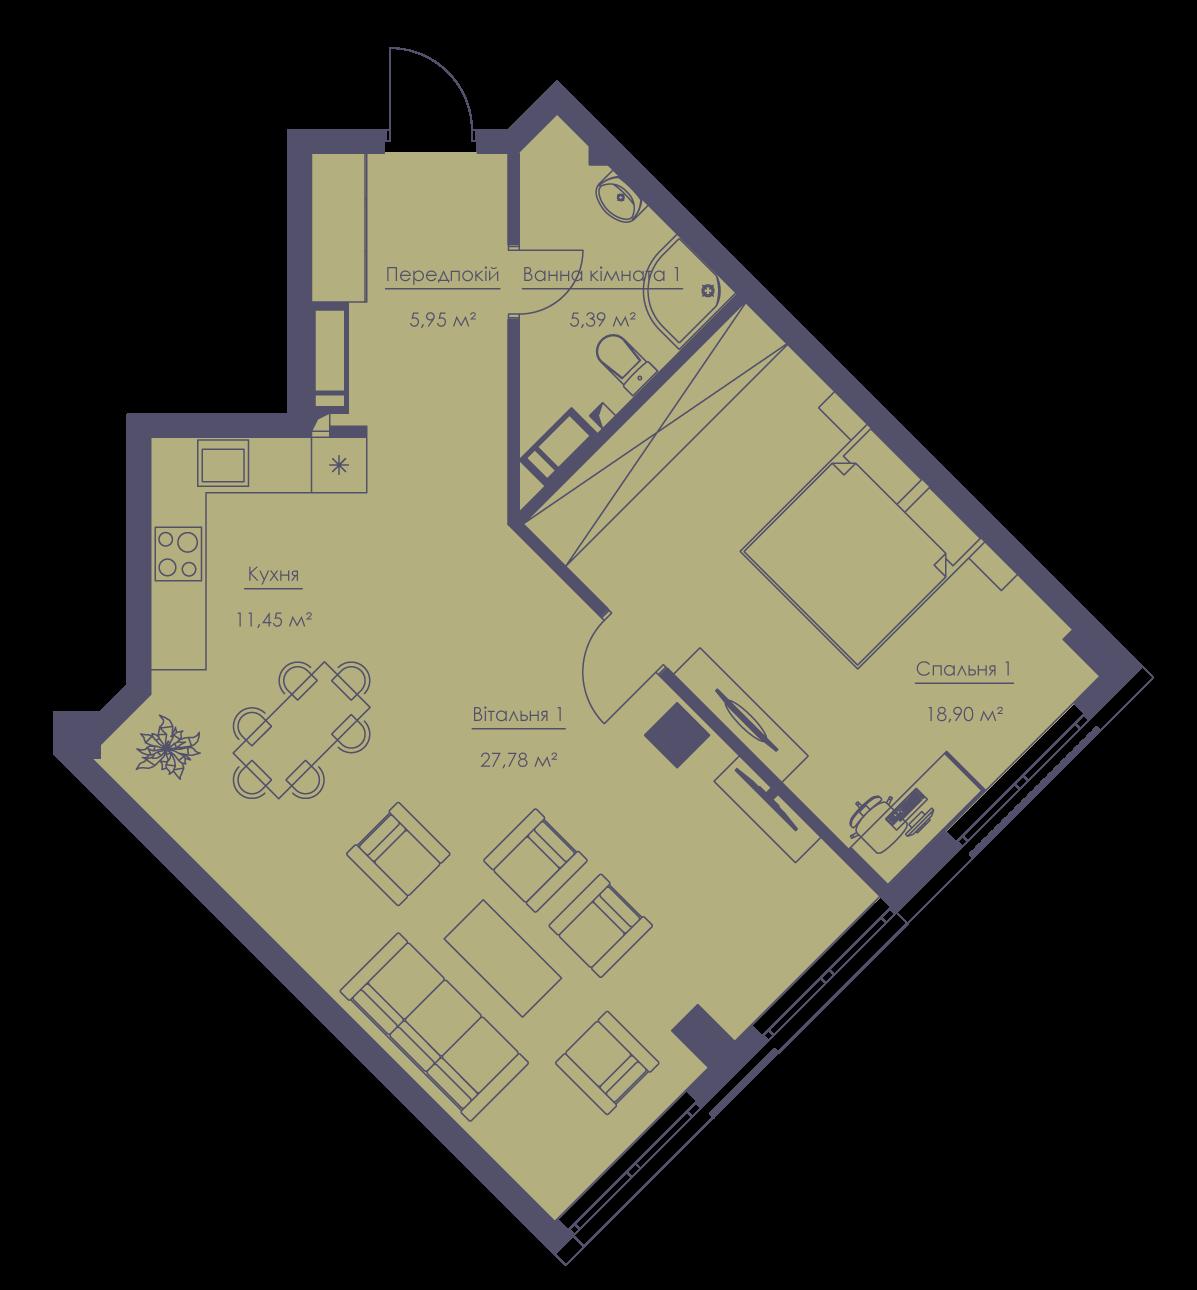 Apartment layout KV_33_2a_1_1_1-1